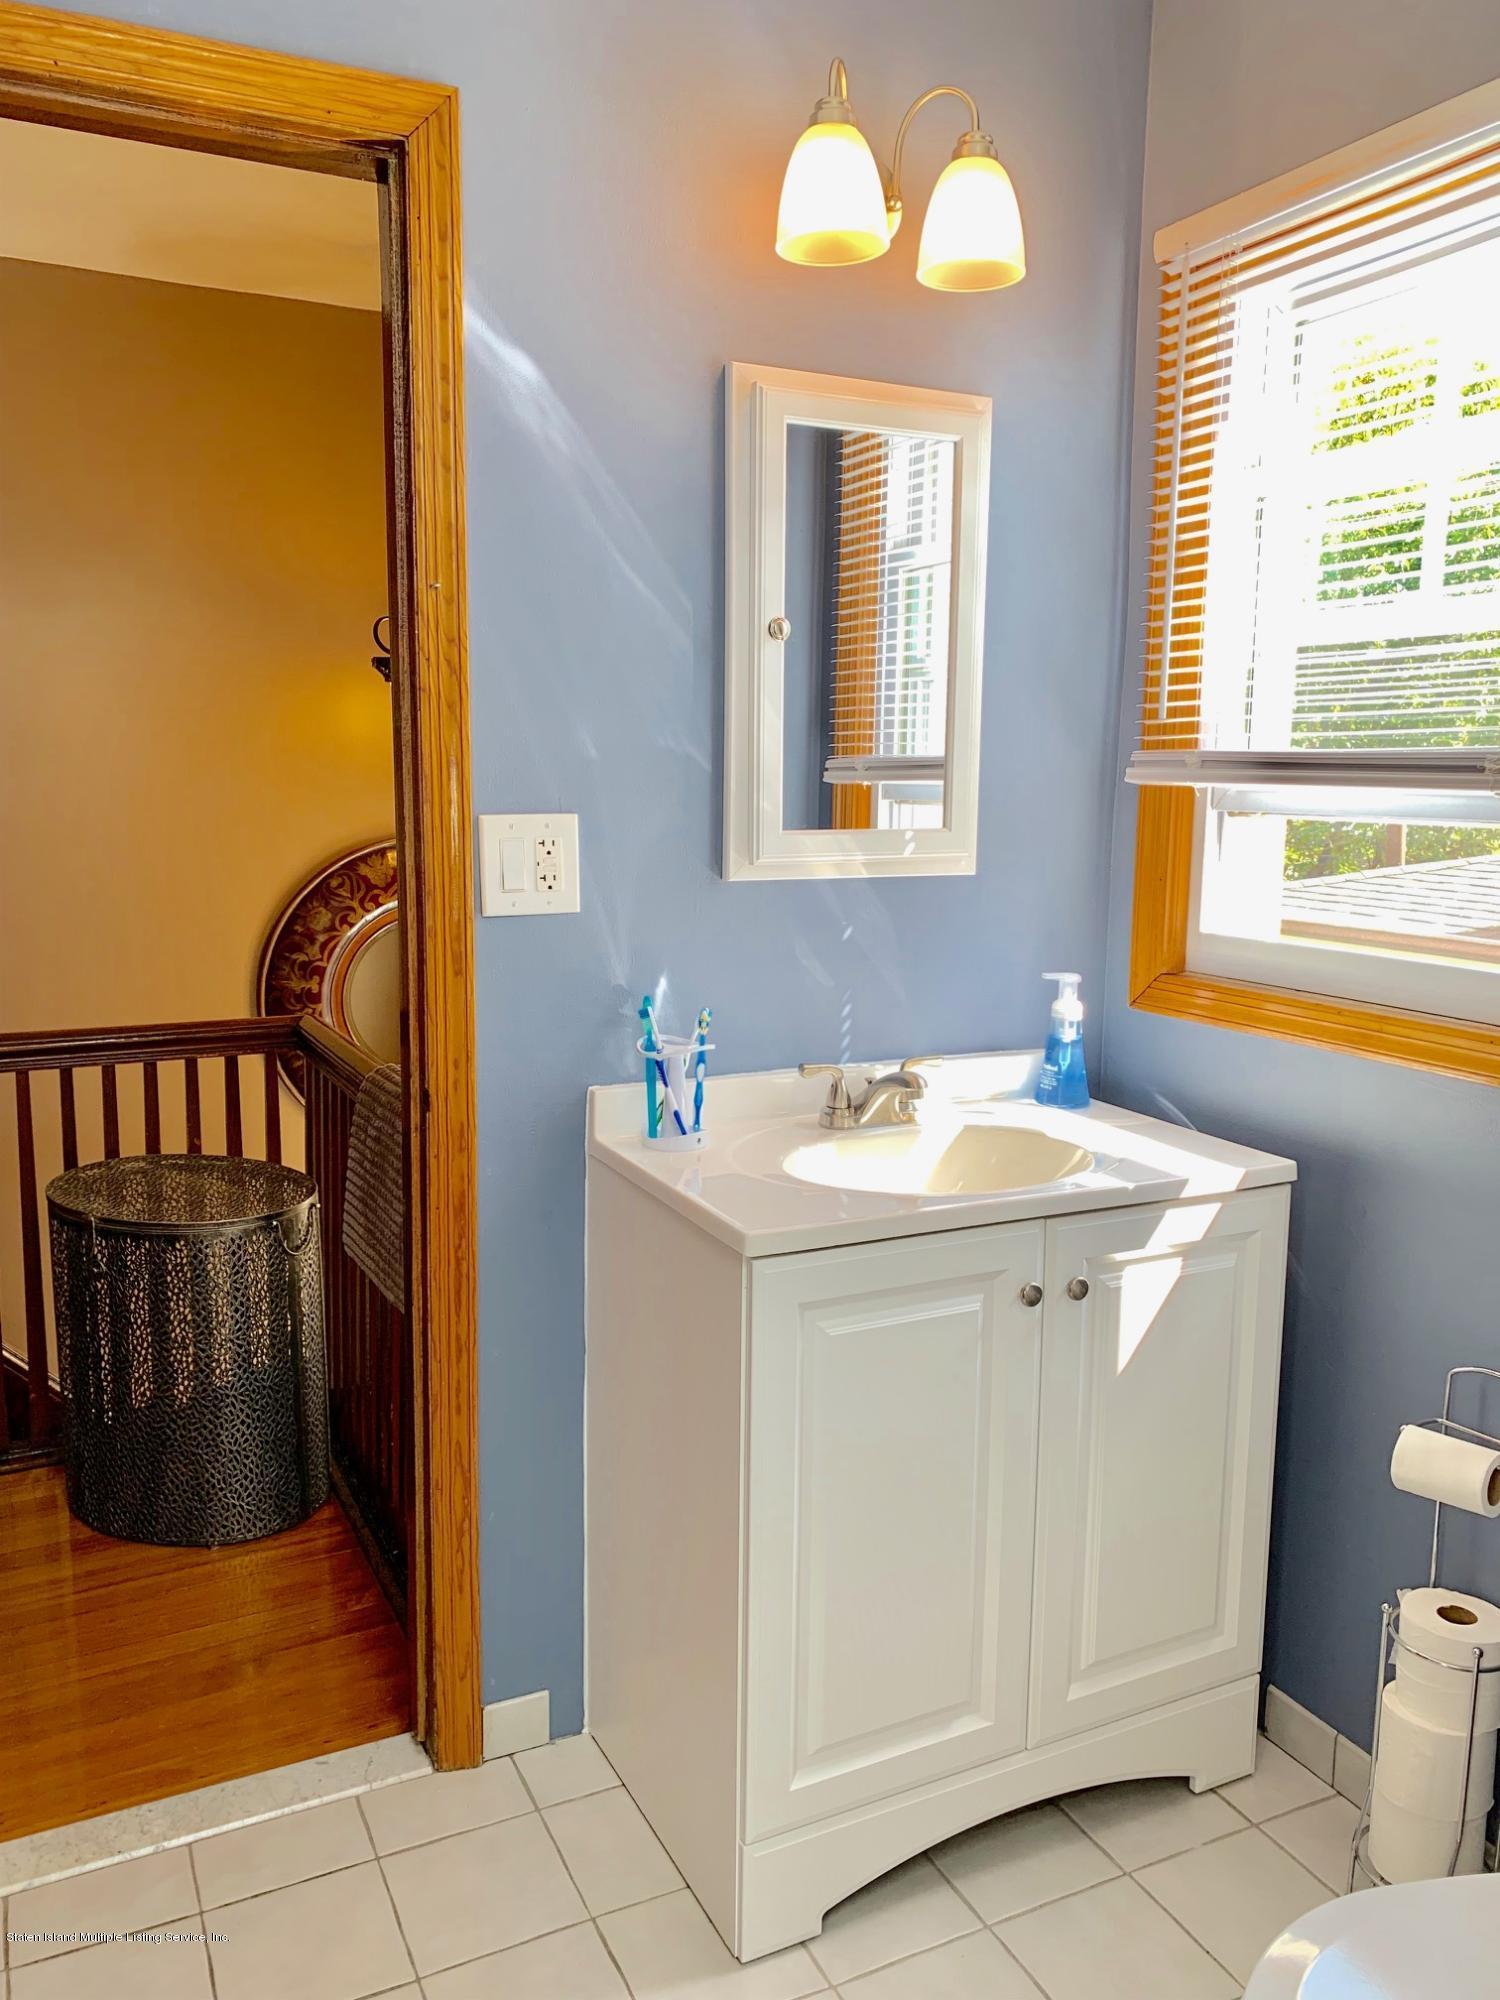 Single Family - Detached 195 Fairview Avenue  Staten Island, NY 10314, MLS-1132423-21